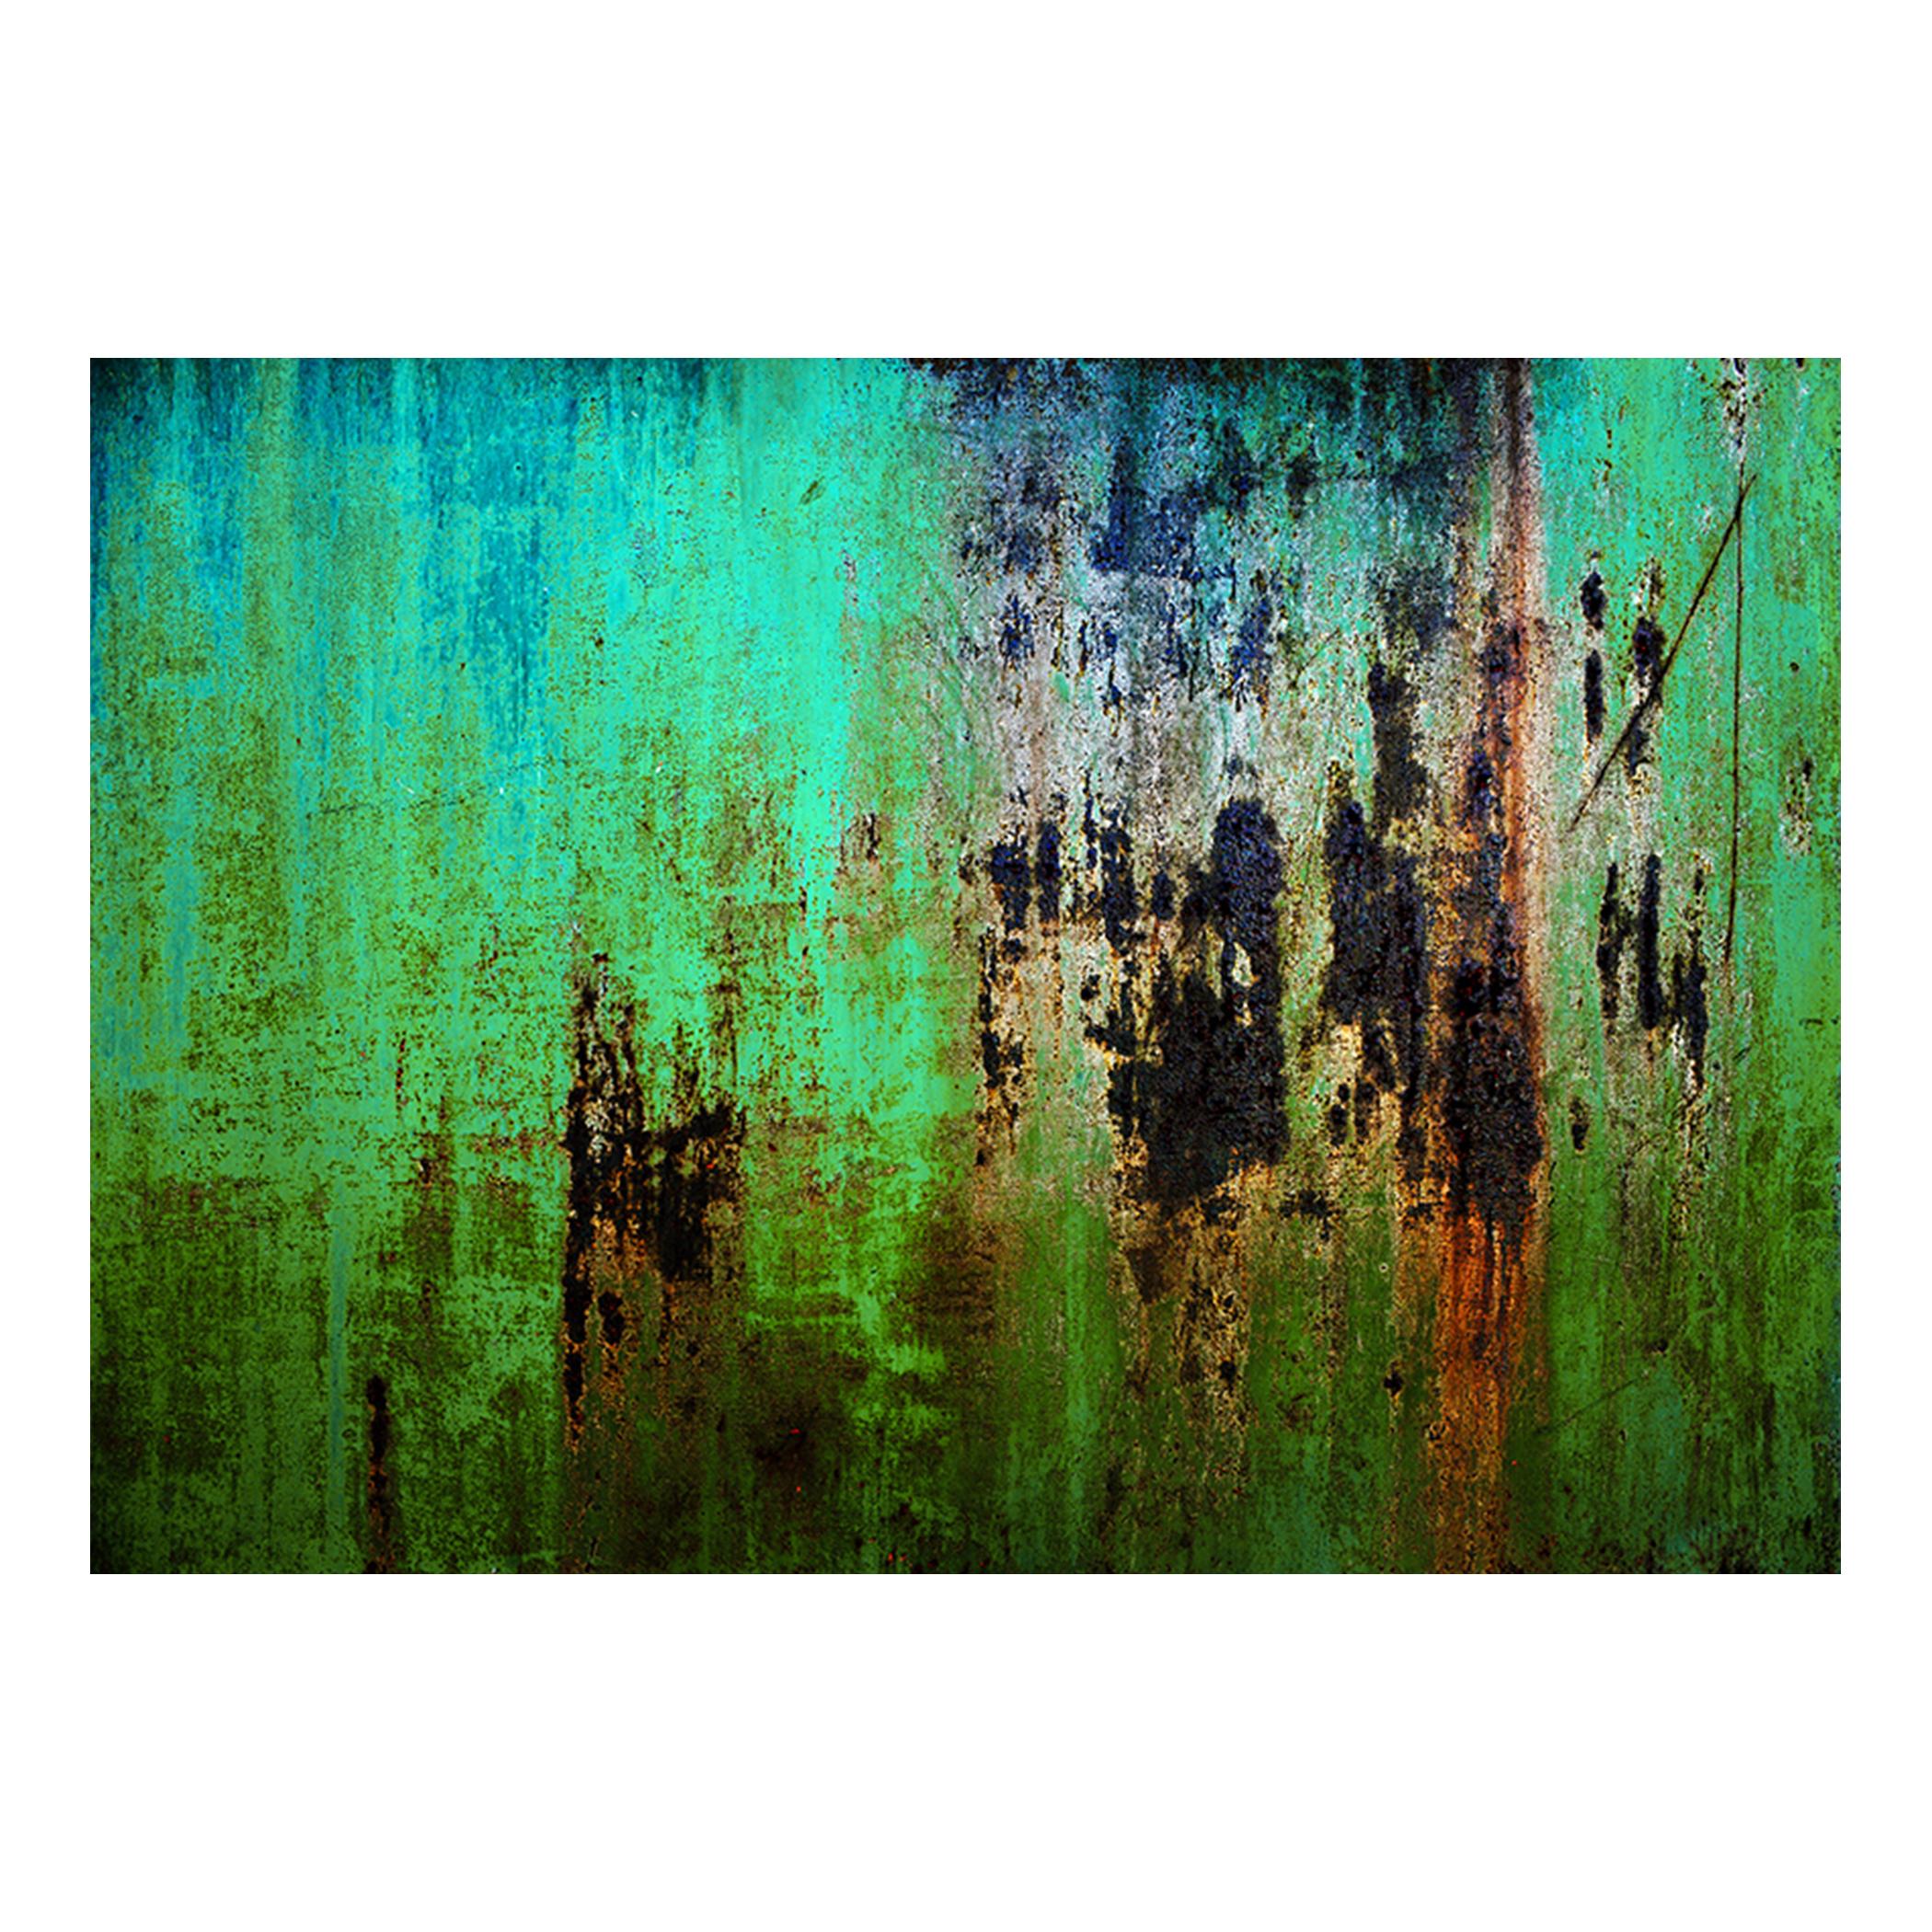 vlies fototapete rost gr n rot 3d metalwand tapete tapeten wandbild xxl 2 farben ebay. Black Bedroom Furniture Sets. Home Design Ideas